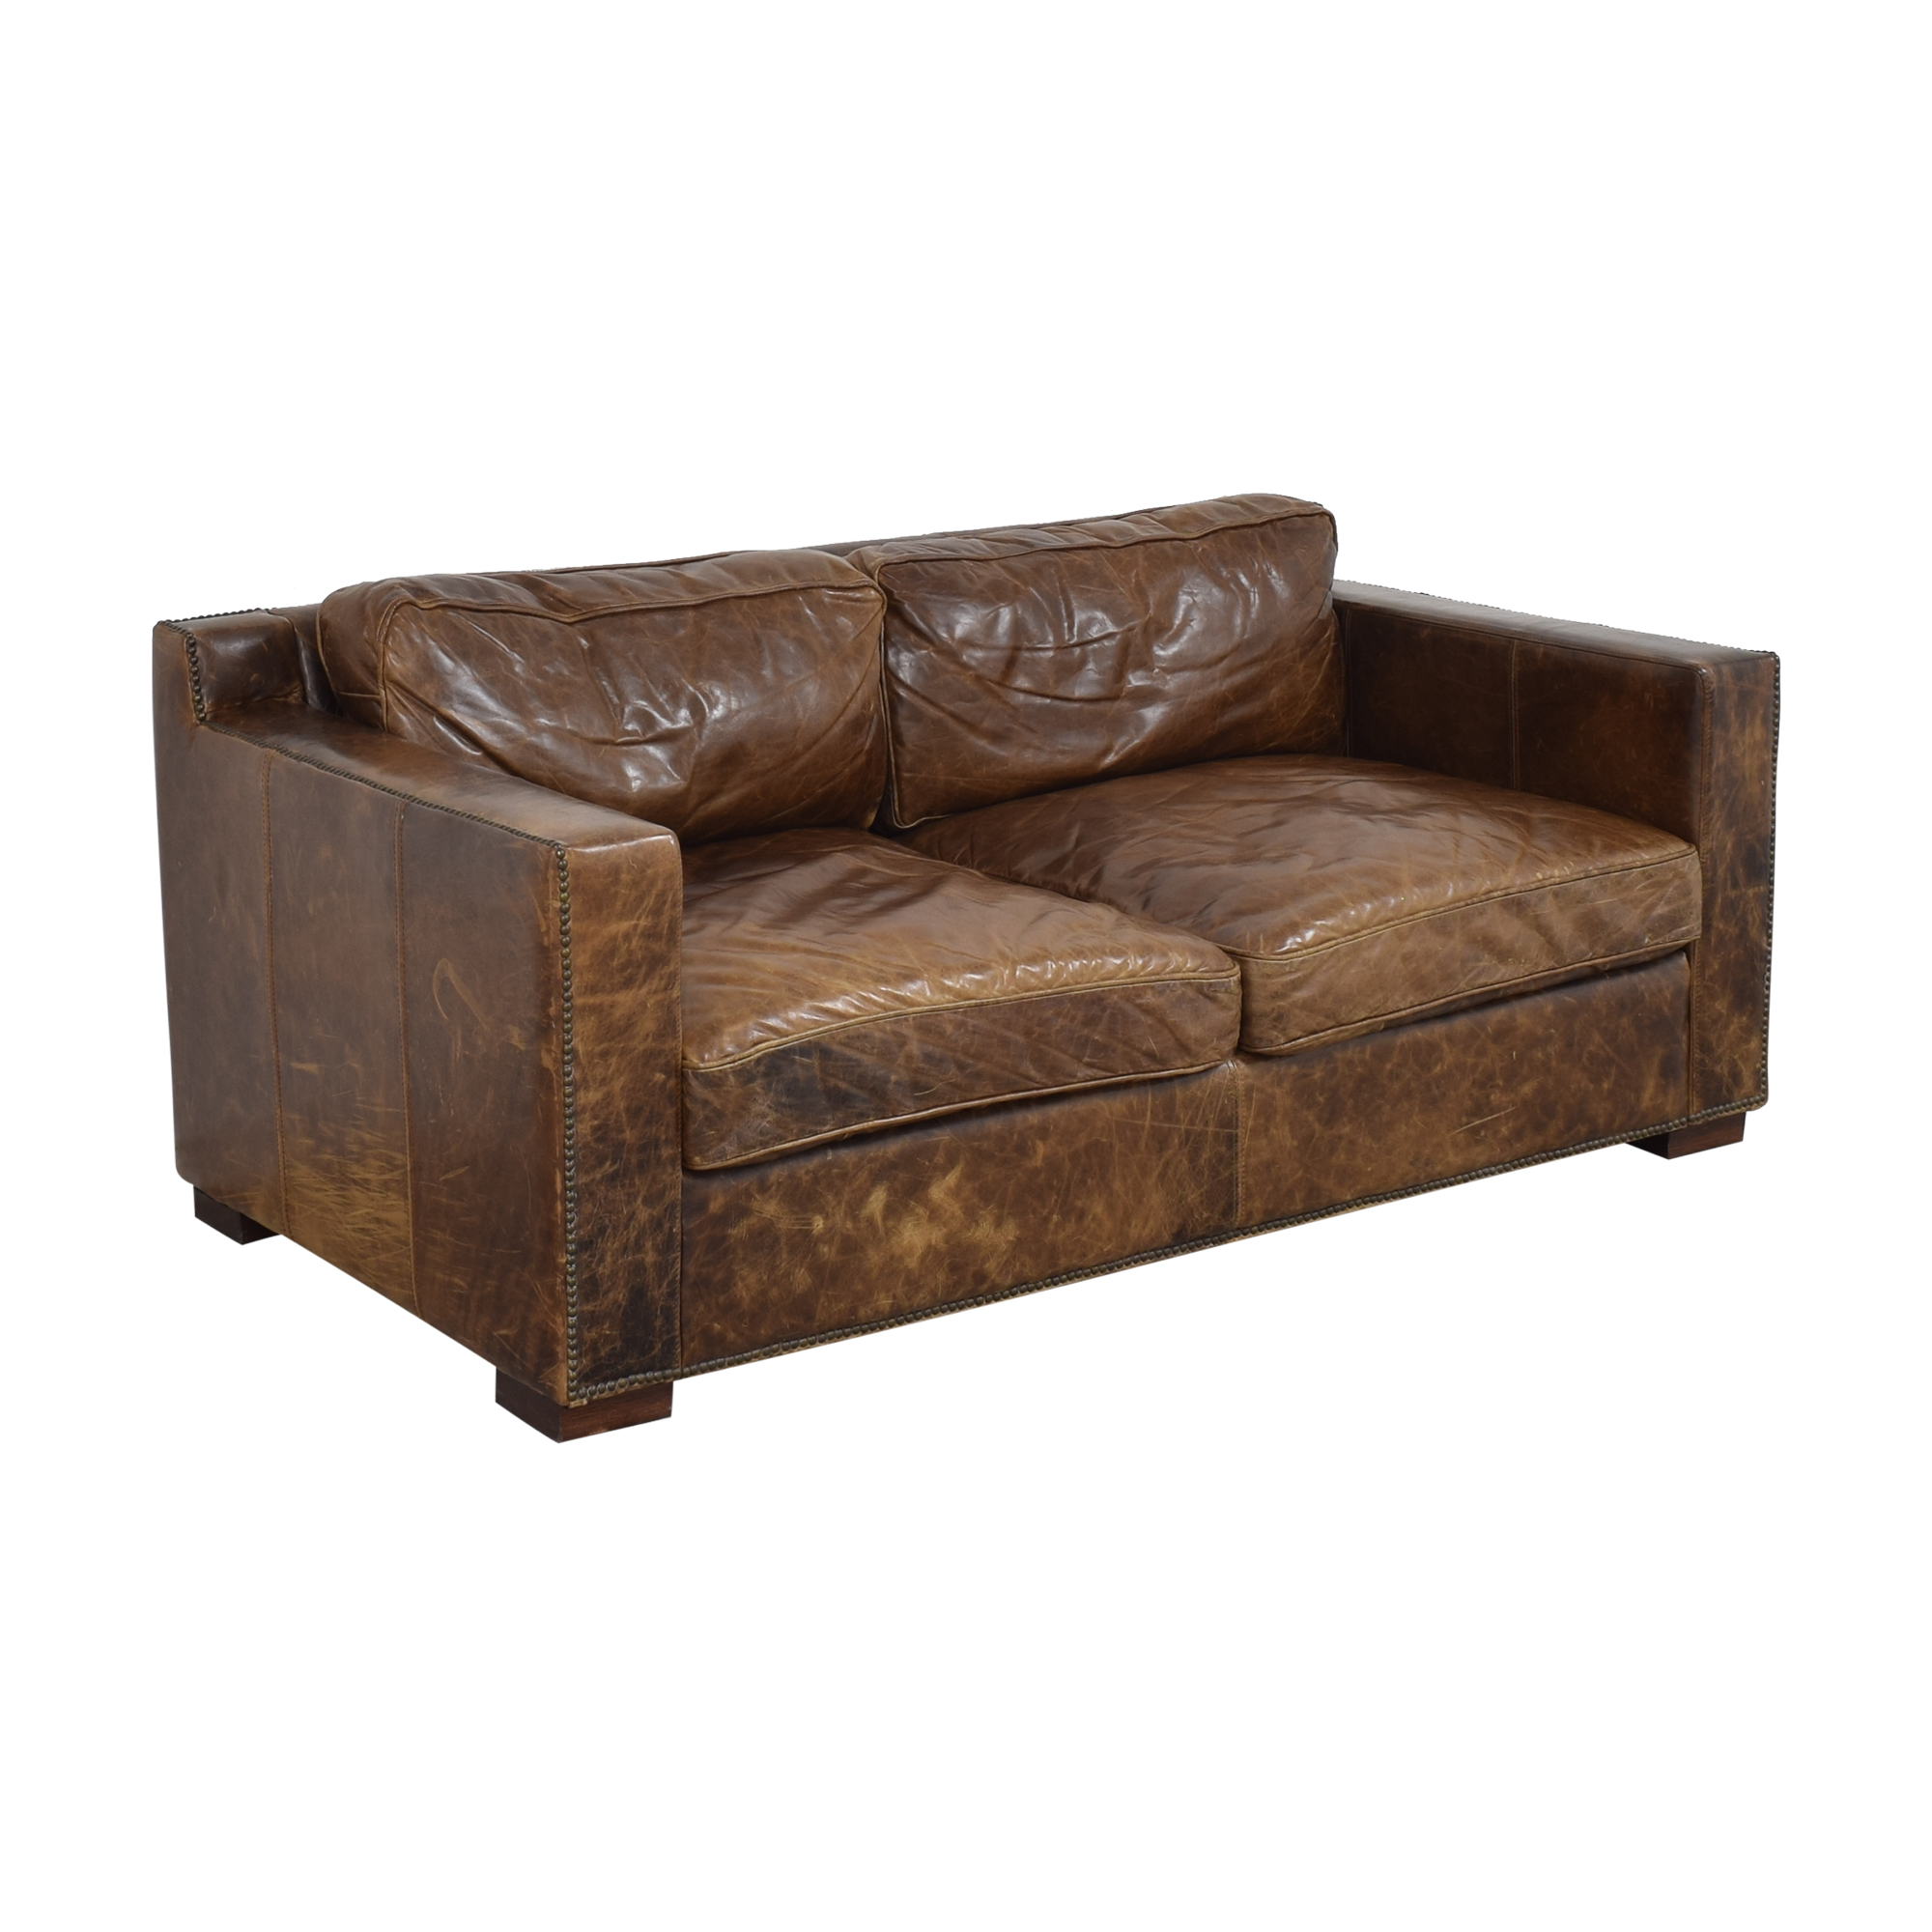 Restoration Hardware Restoration Hardware Collins Sofa with Nailheads coupon